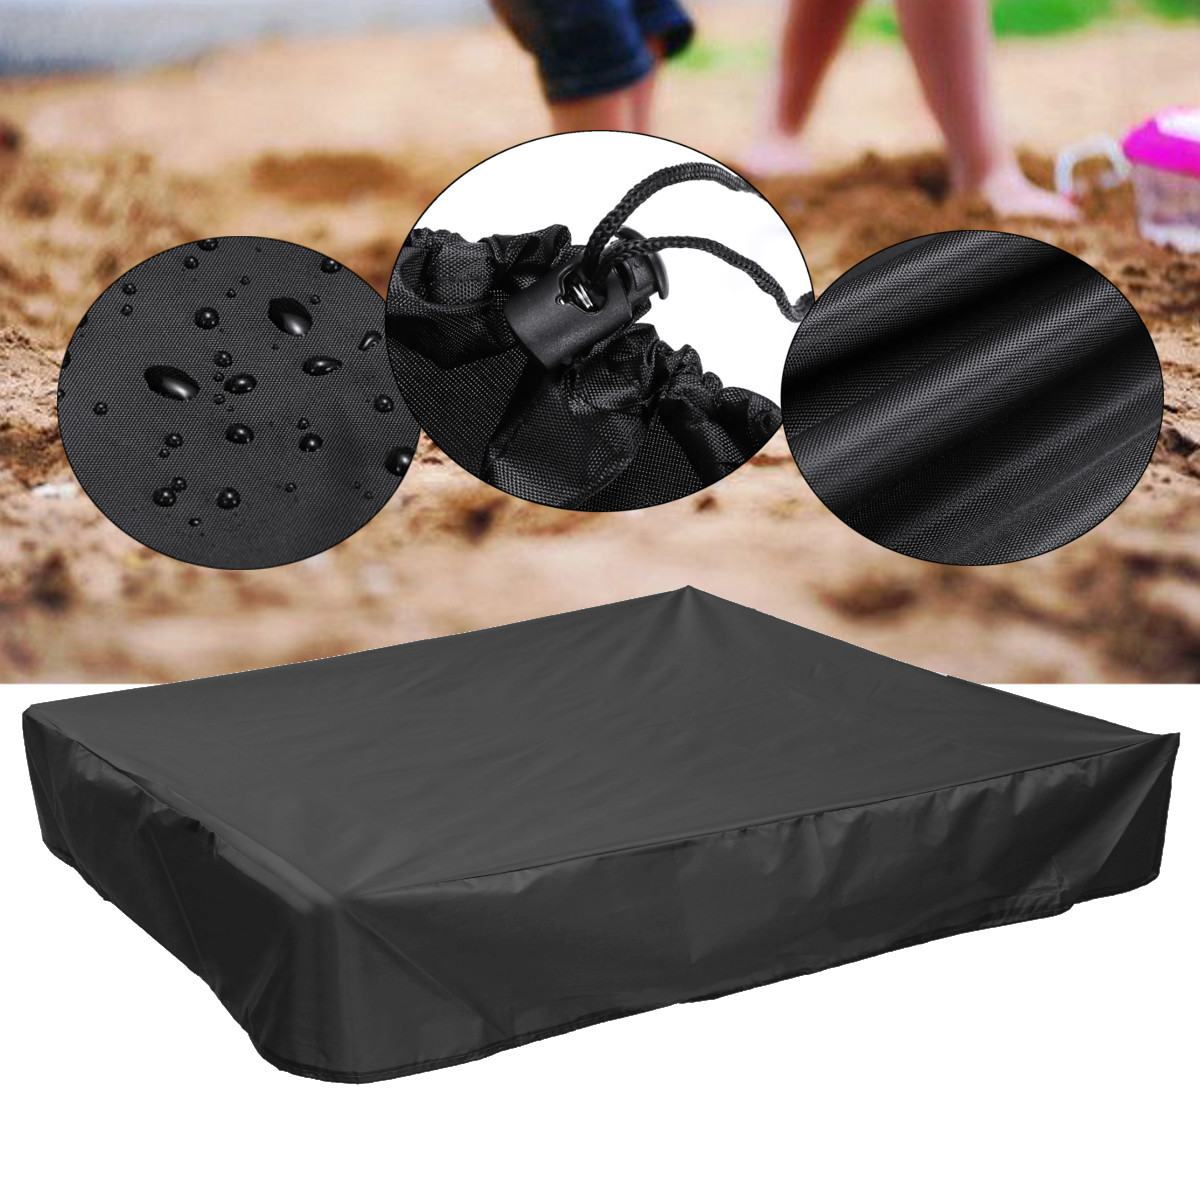 Oxford Green Sandbox Sandpit Cover Dustproof Waterproof with Drawstring HOT